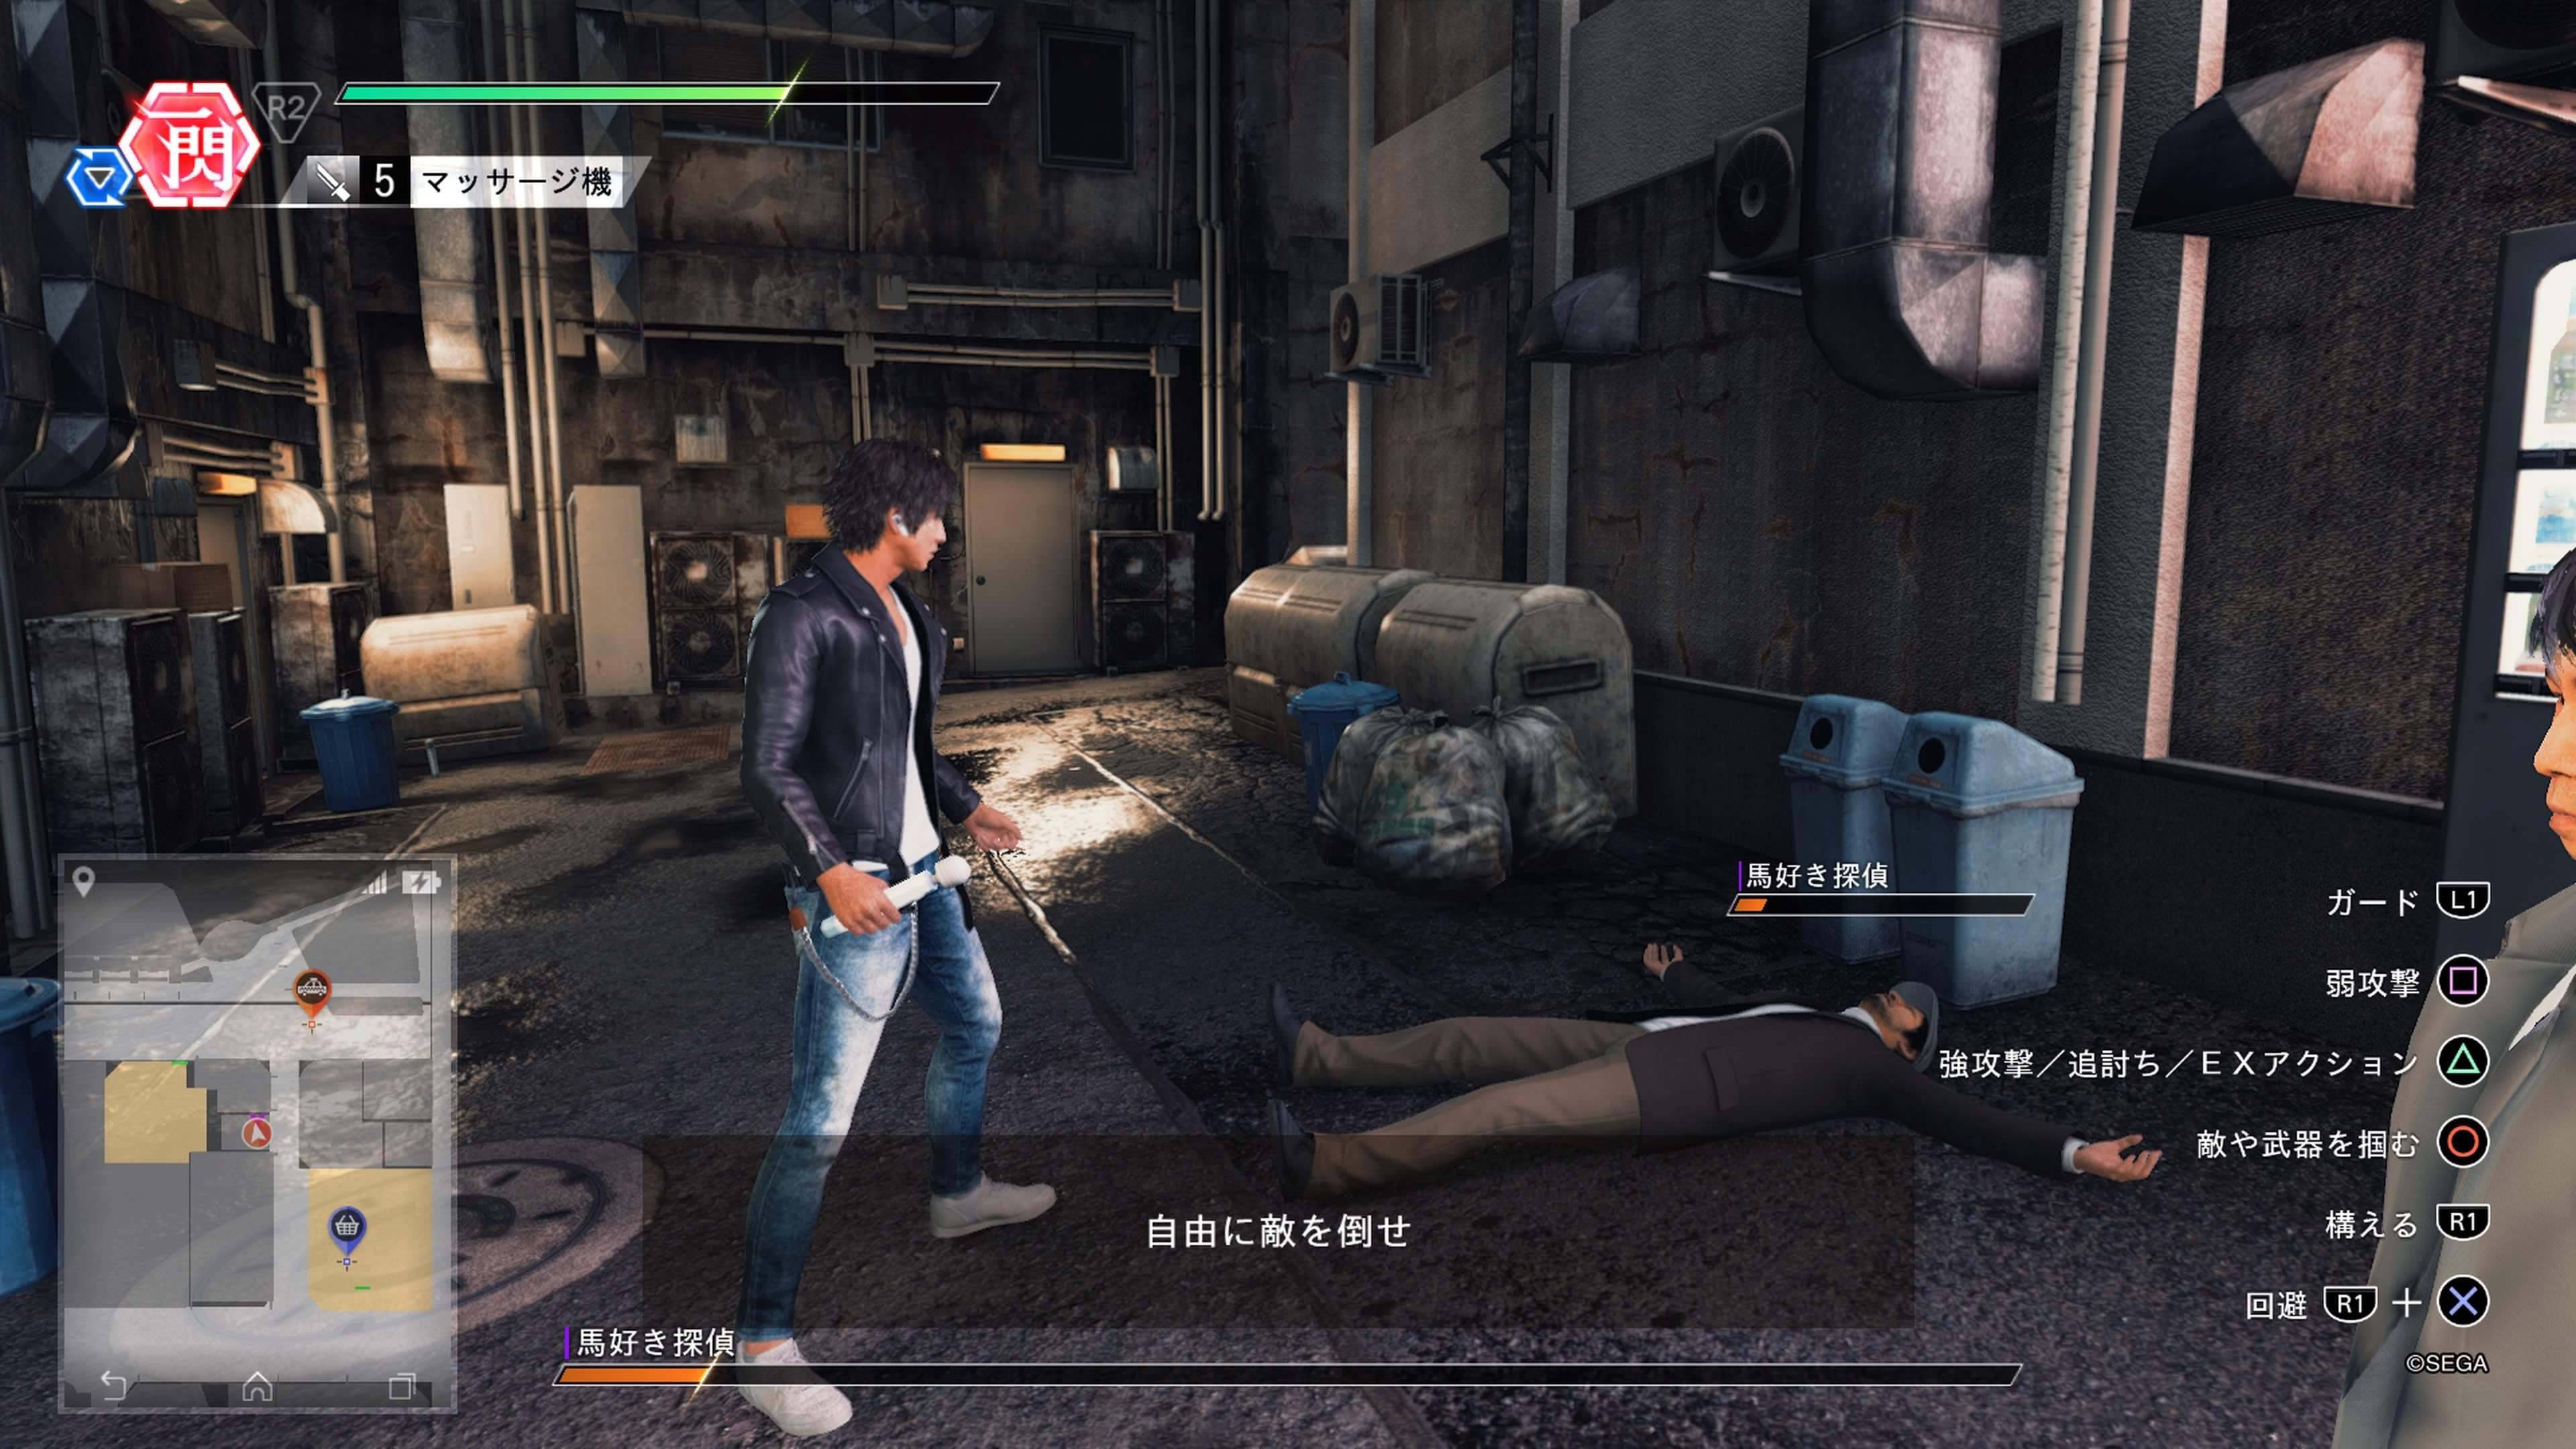 Japanese Celebrity Attacks Enemies With Vibrator In New Sega Game